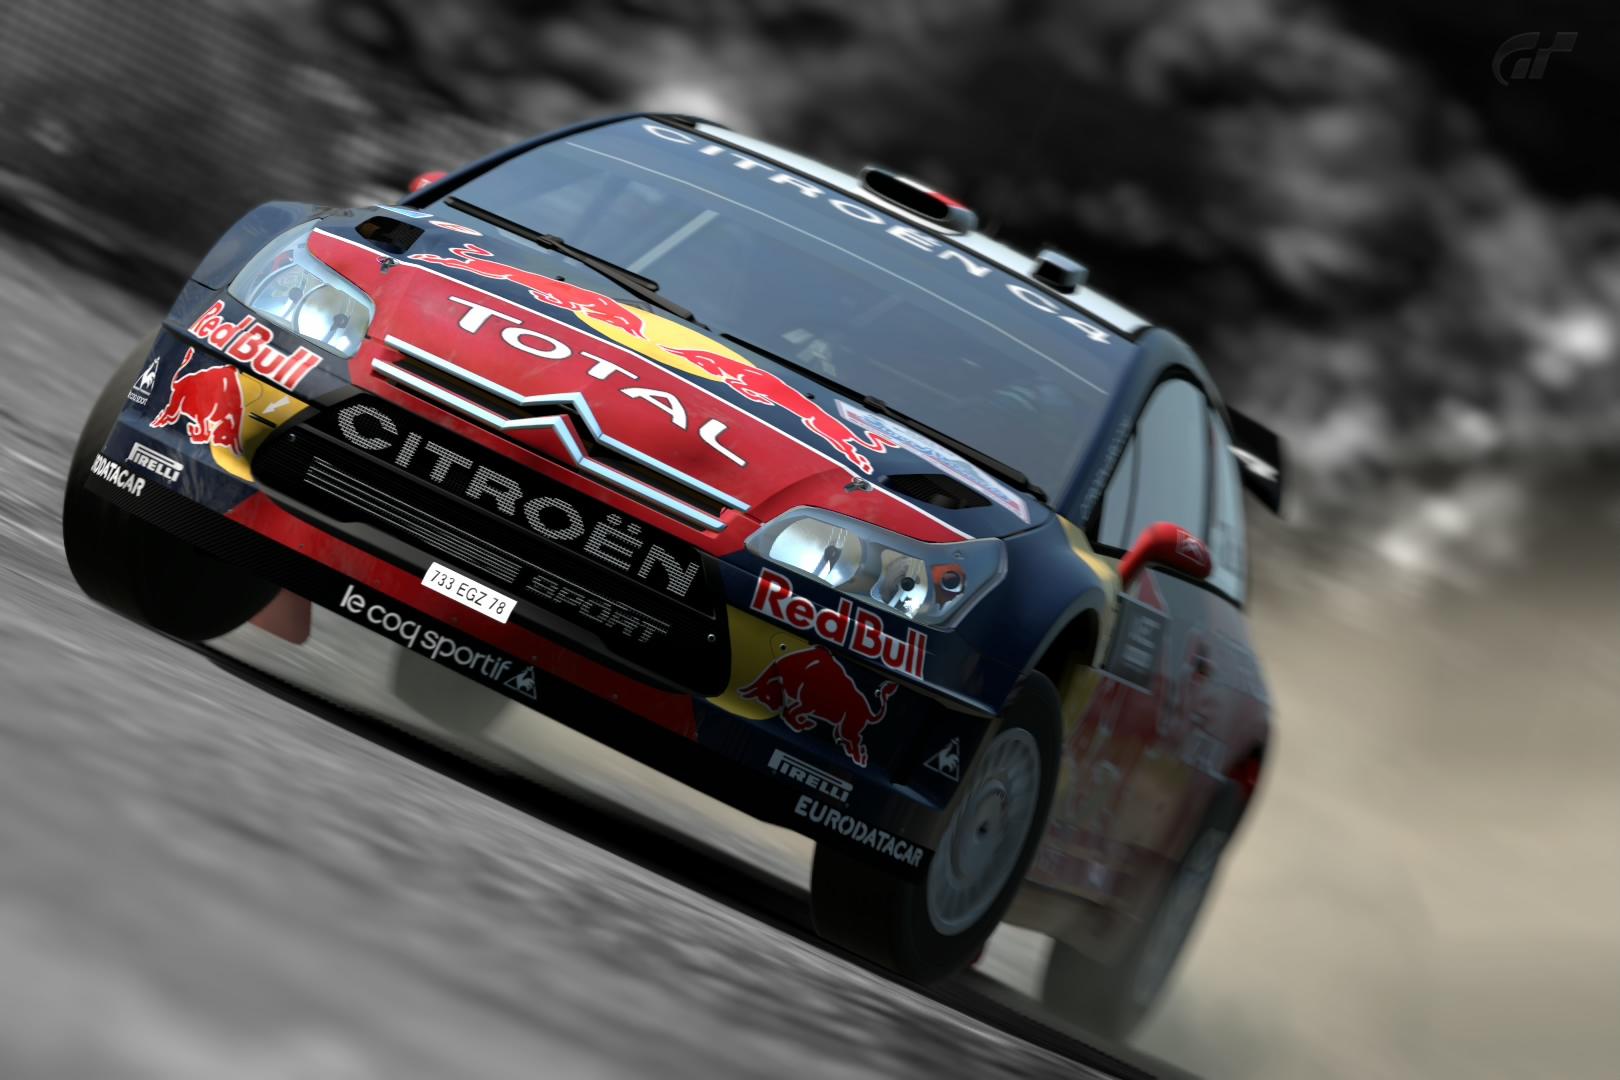 Citroën C4 WRC - by Riki